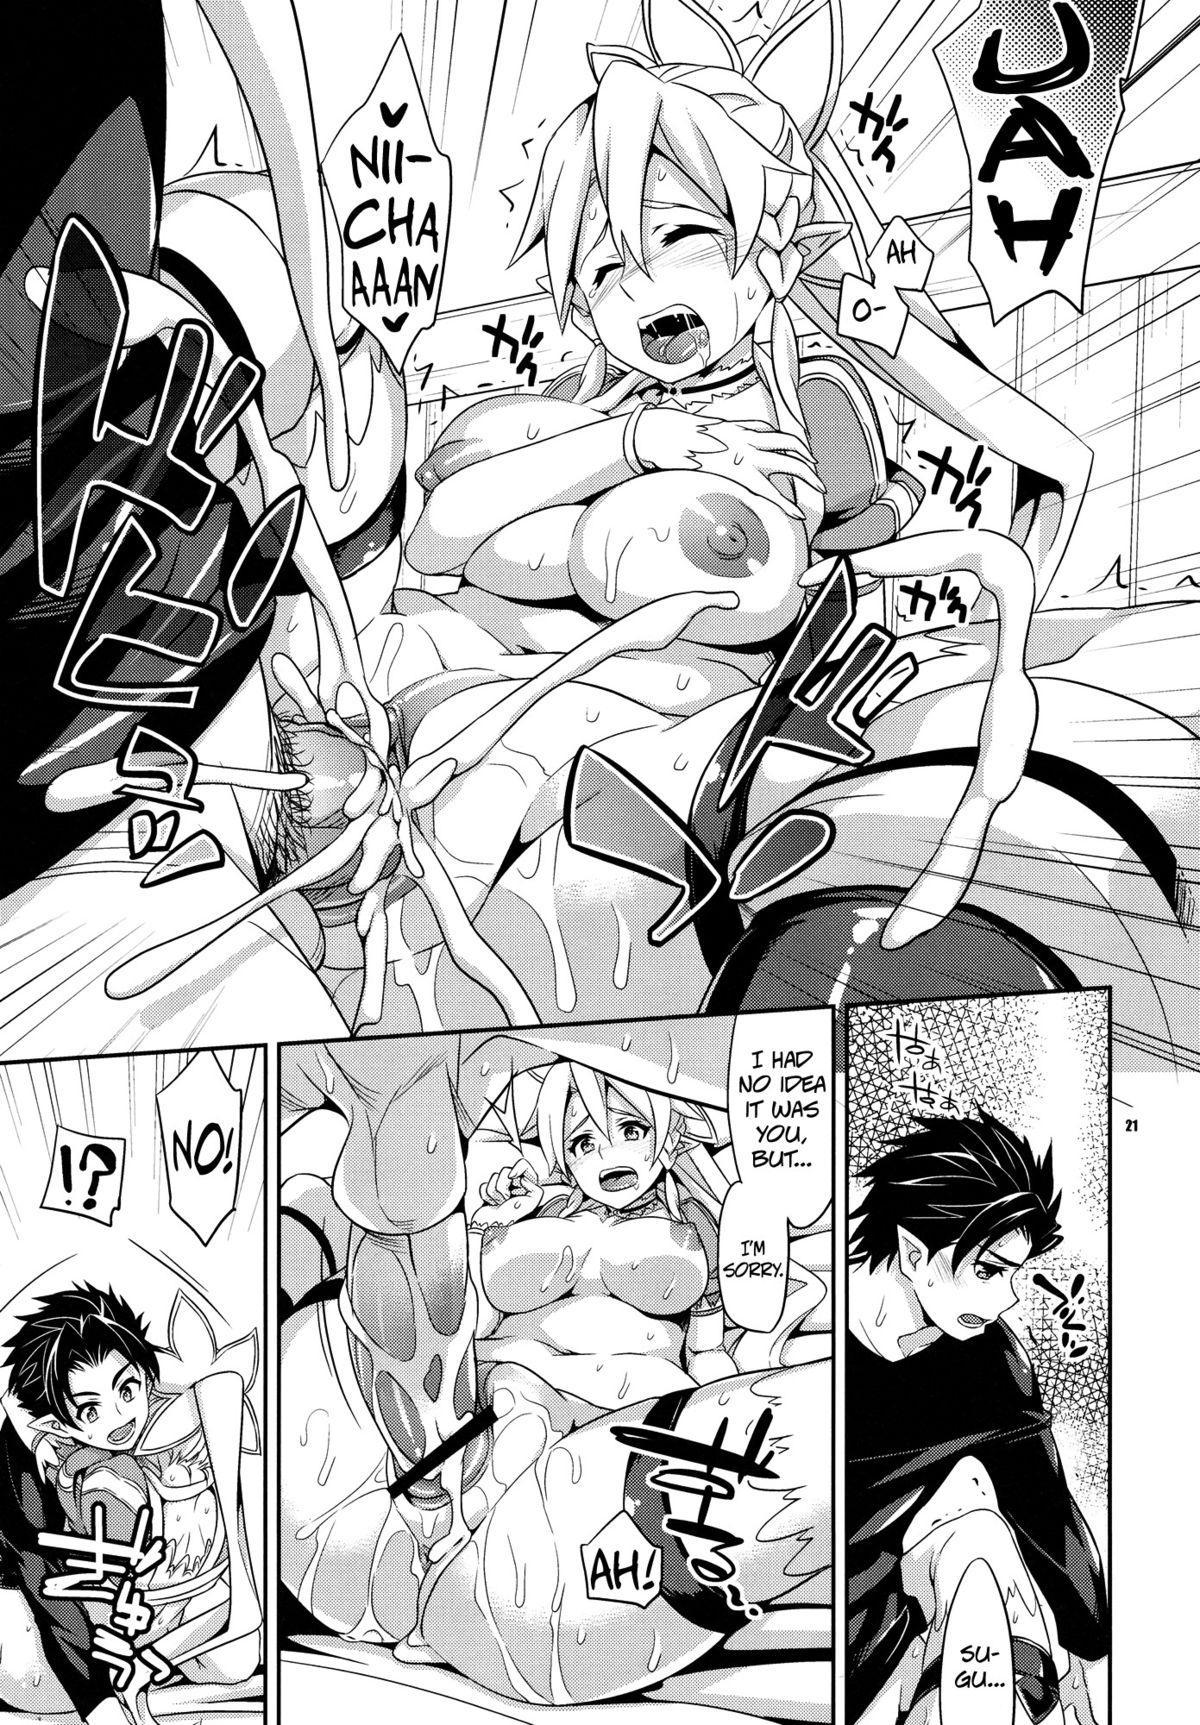 (C83) [Crazy9 (Ichitaka)] C9-03 Suguha to Lyfa to Oniichan no Shiawase Kazoku Keikaku   Plan For a Happy Family-Life with Suguha, Leafa, and Onii-chan (Sword Art Online) [English] {doujin-moe.us} 19